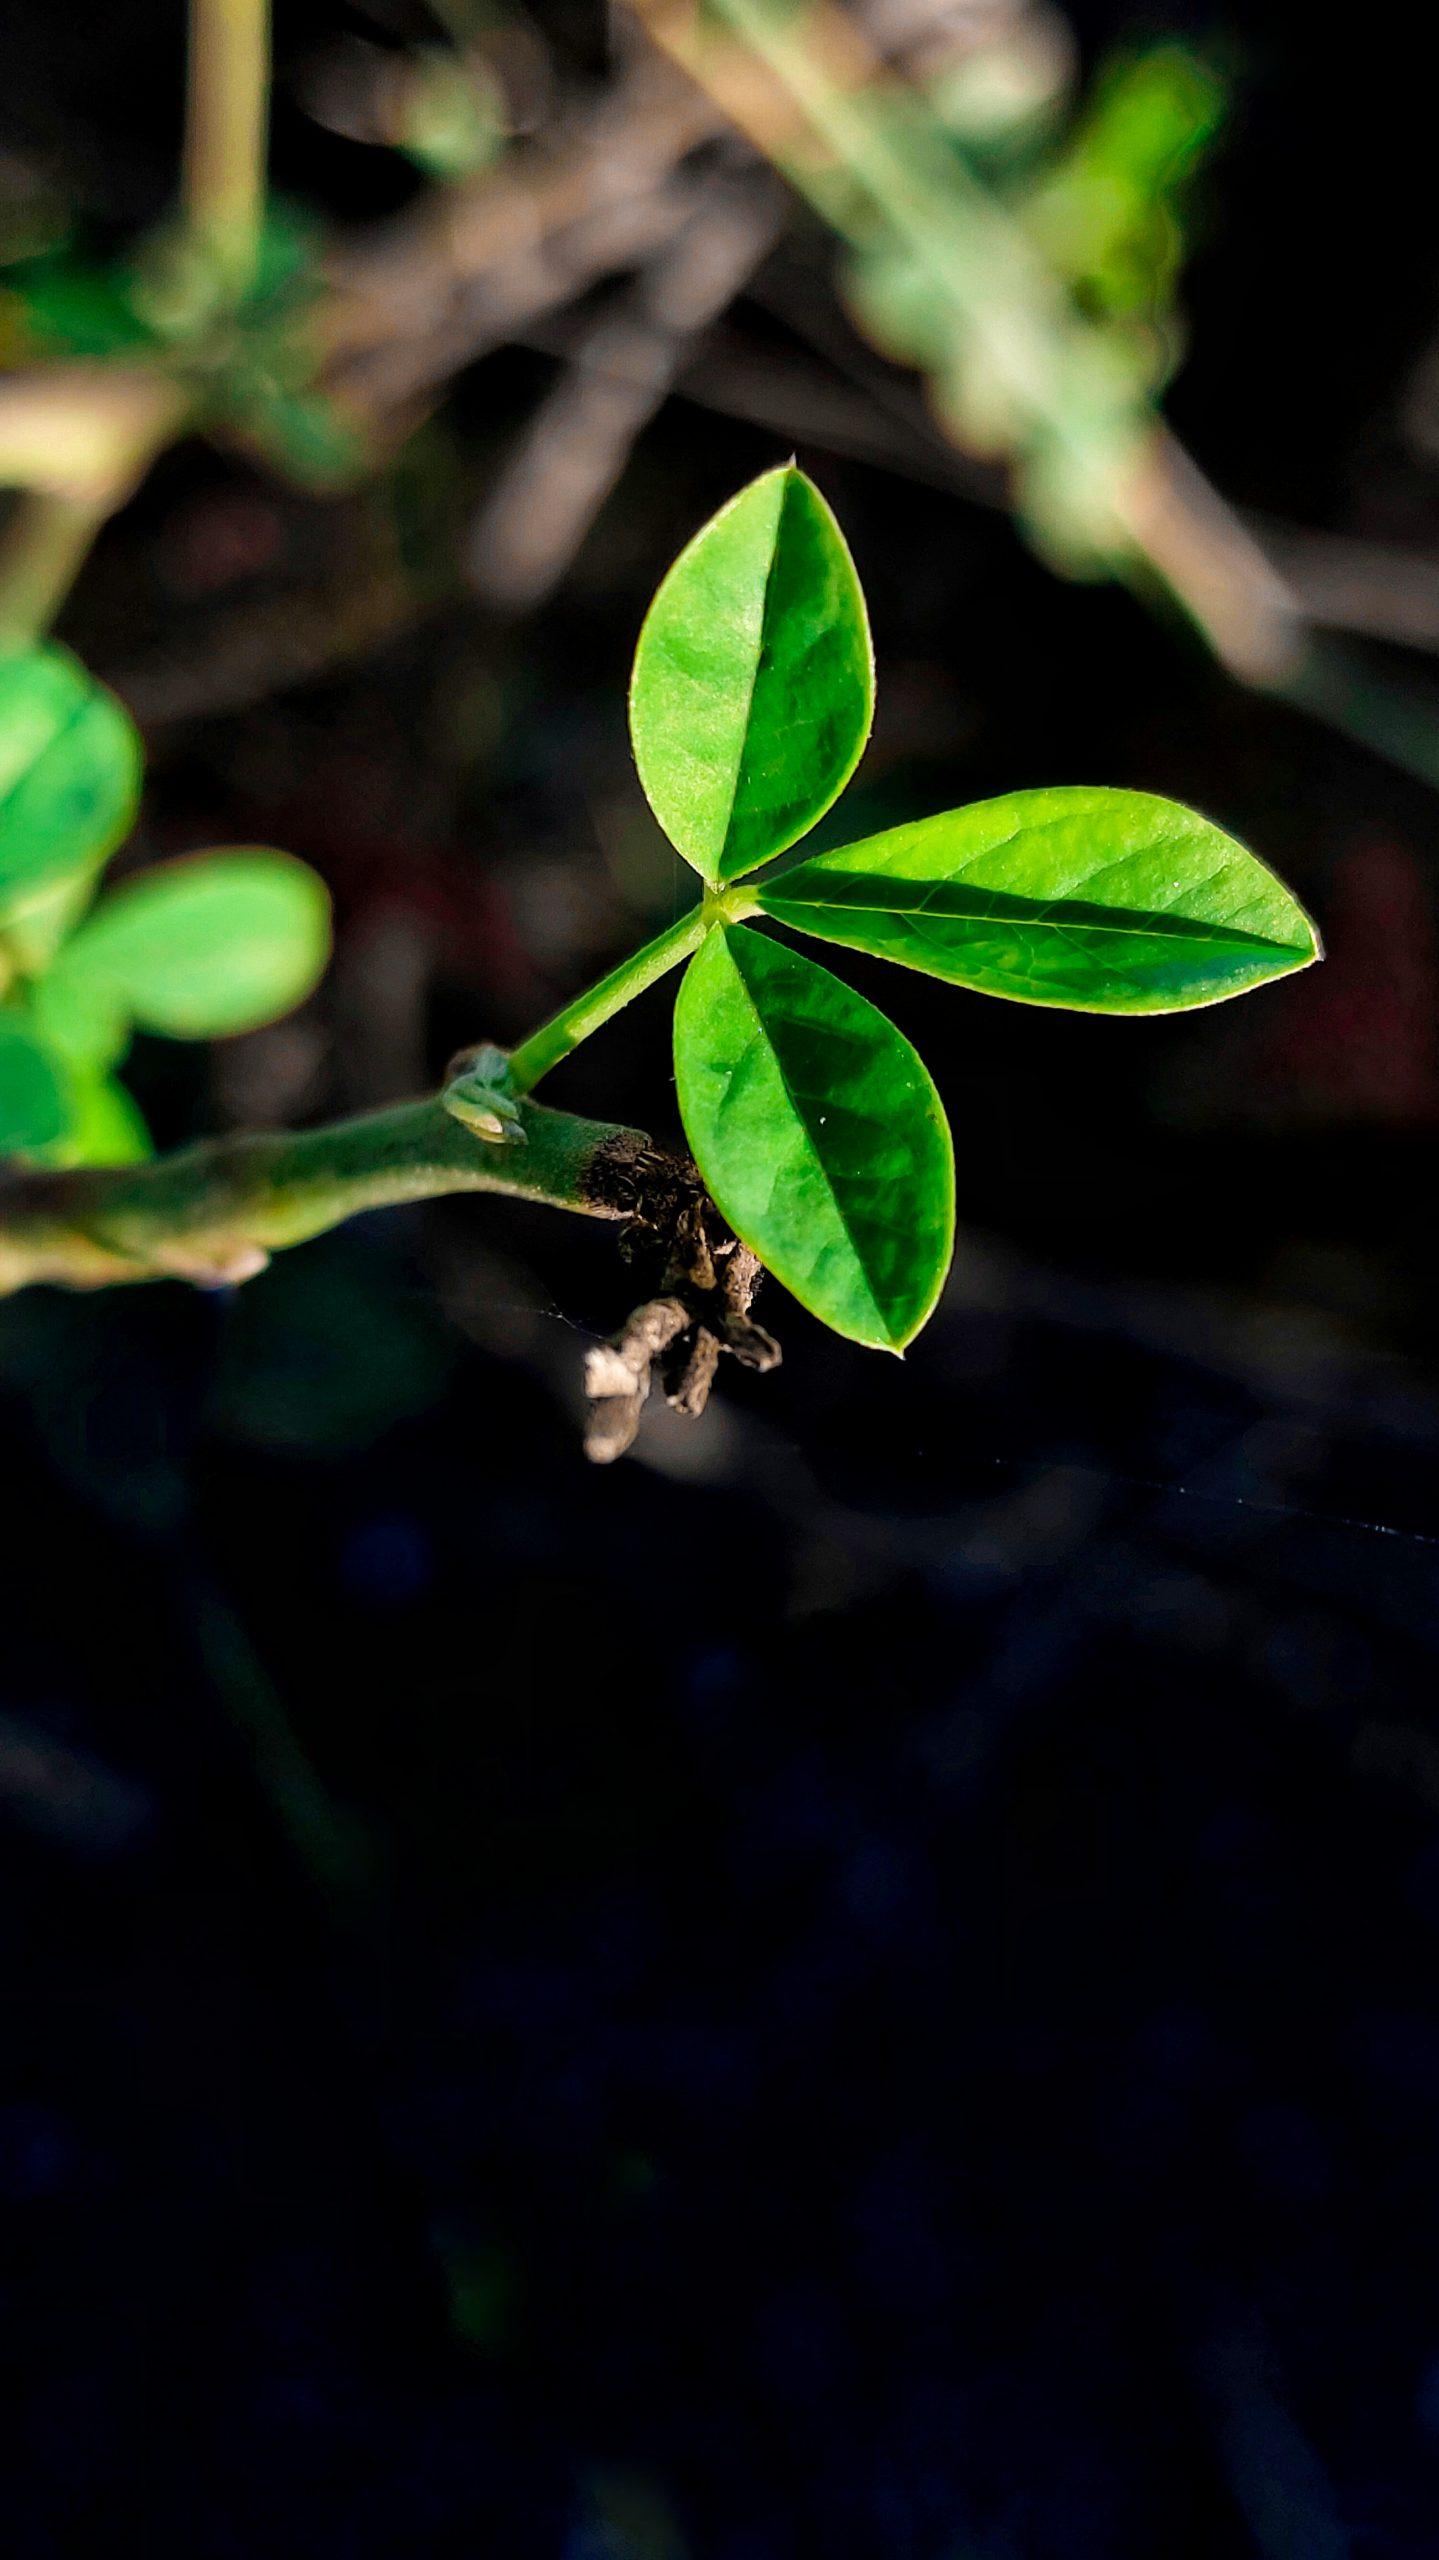 Plant leaves on plant